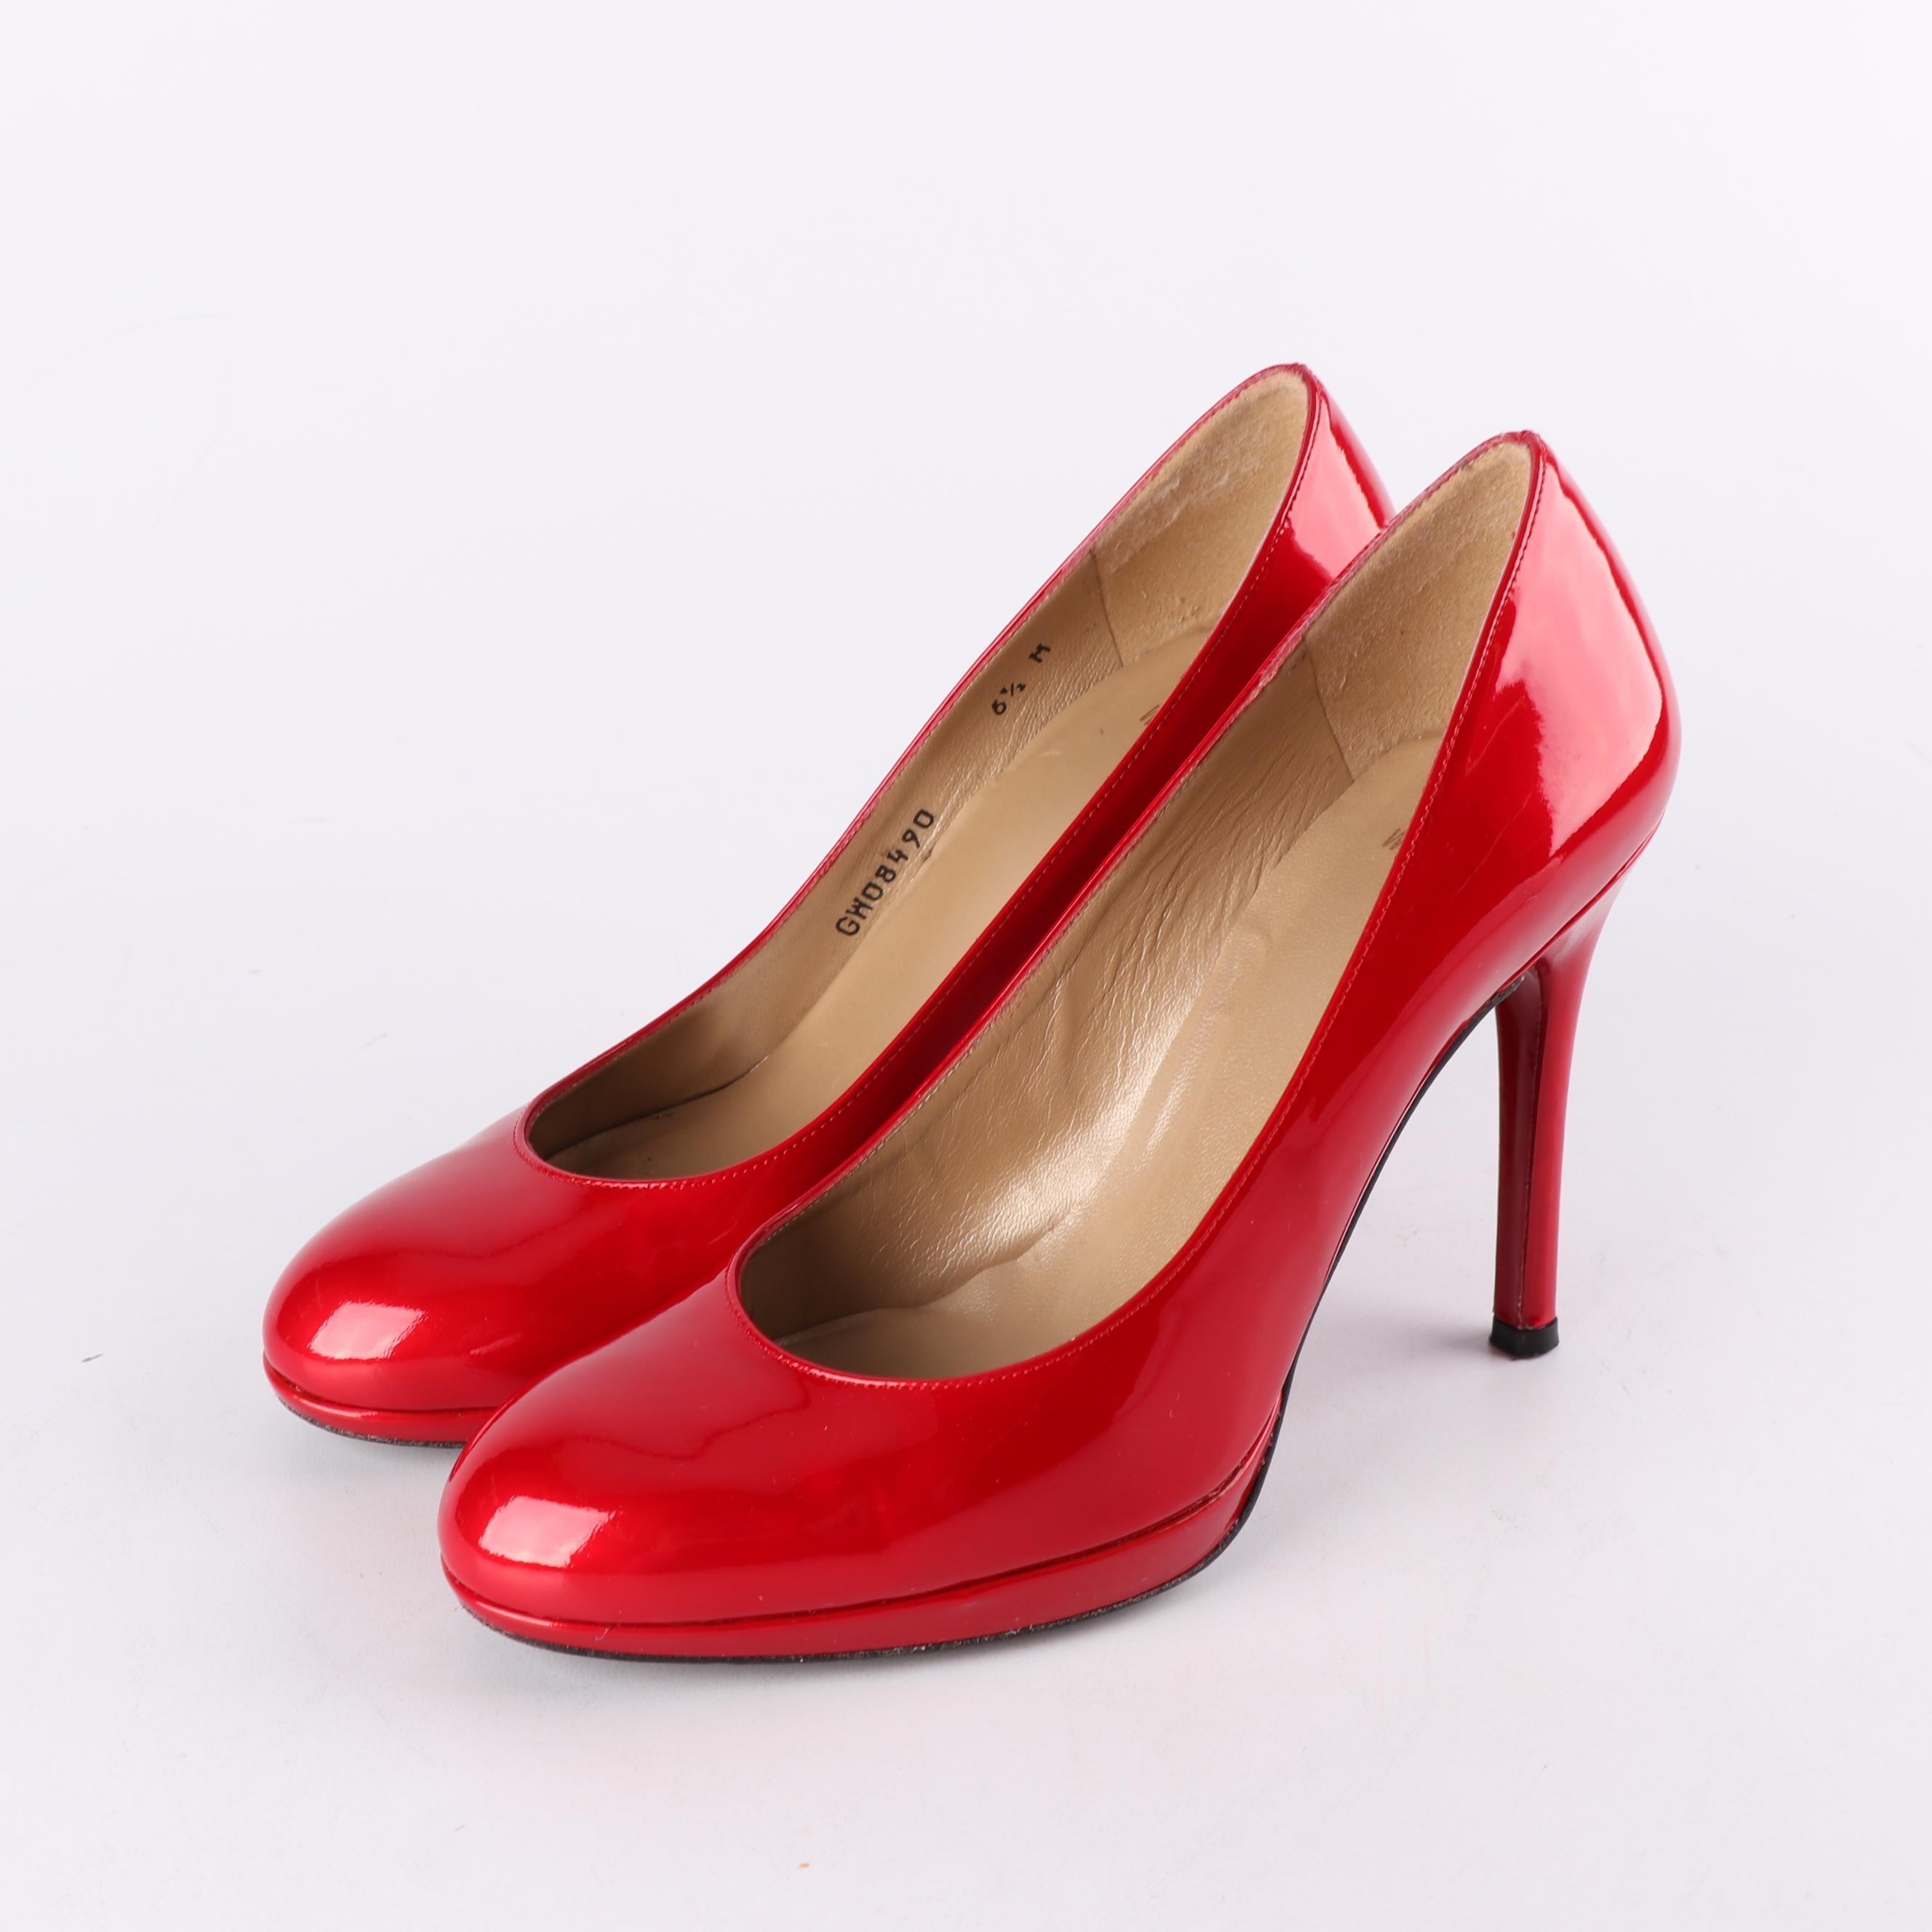 Women's Stuart Weitzman Red Patent Leather Platform Pumps